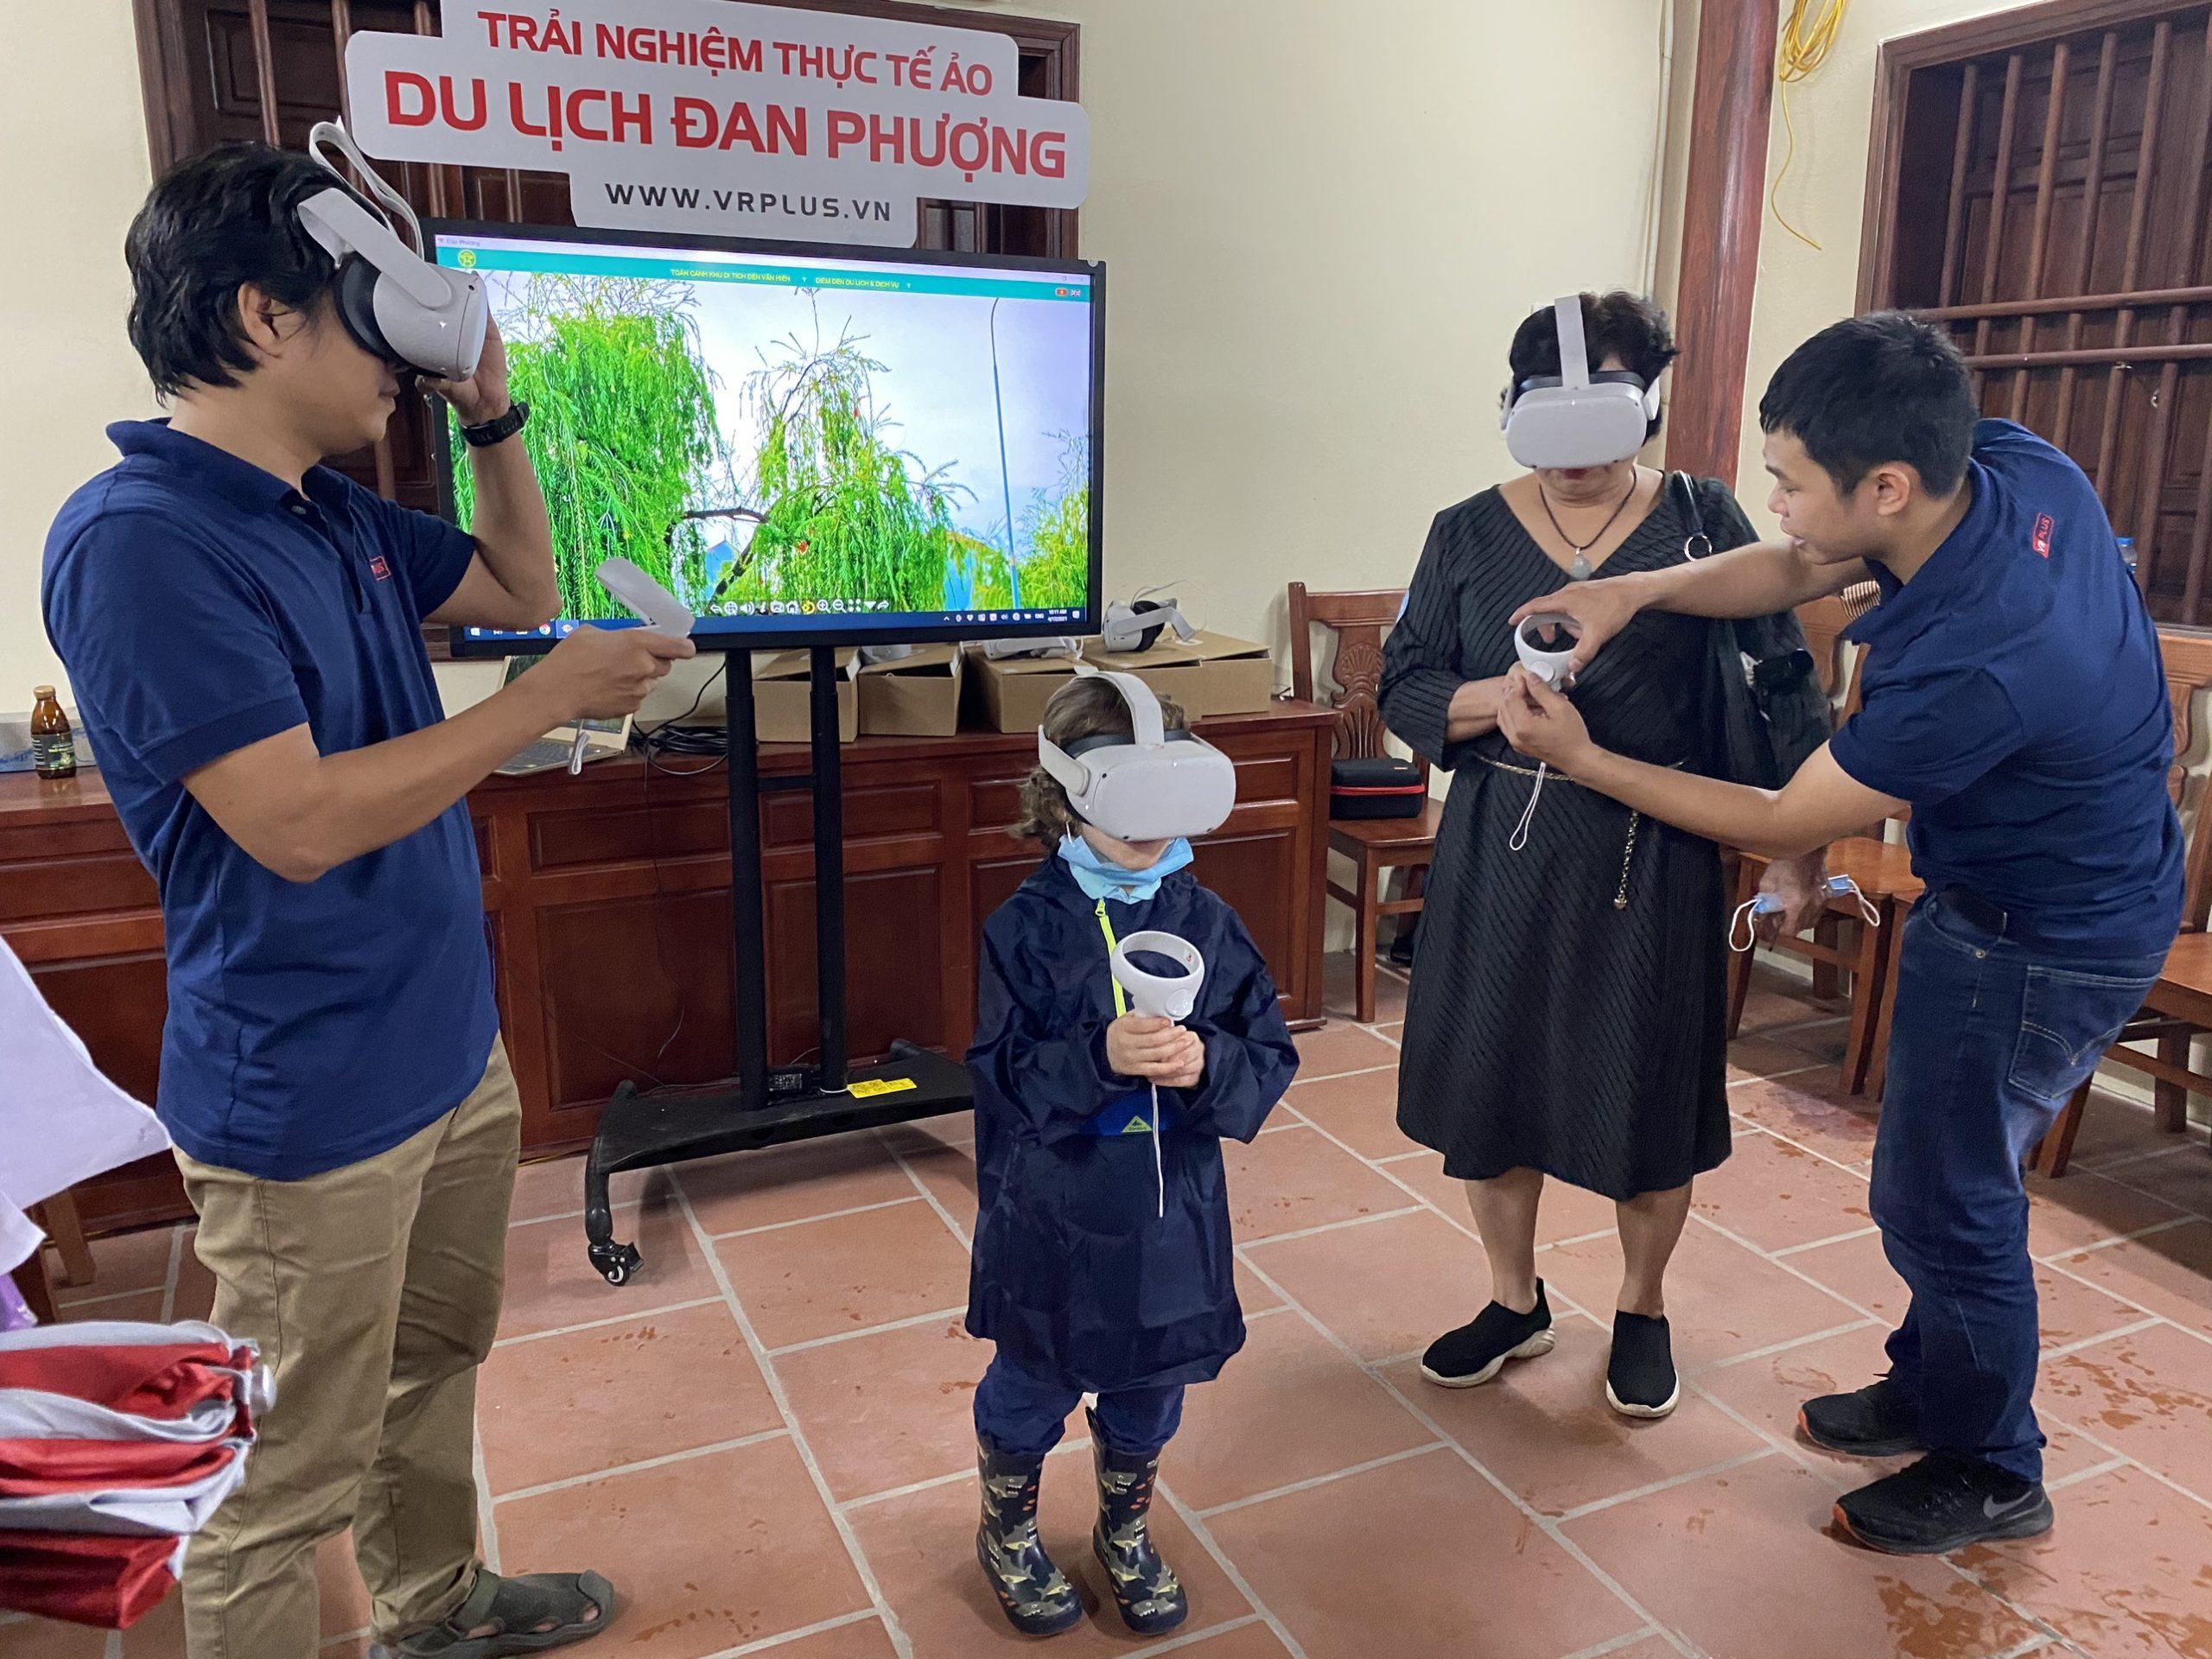 Trai nghiem kinh VR